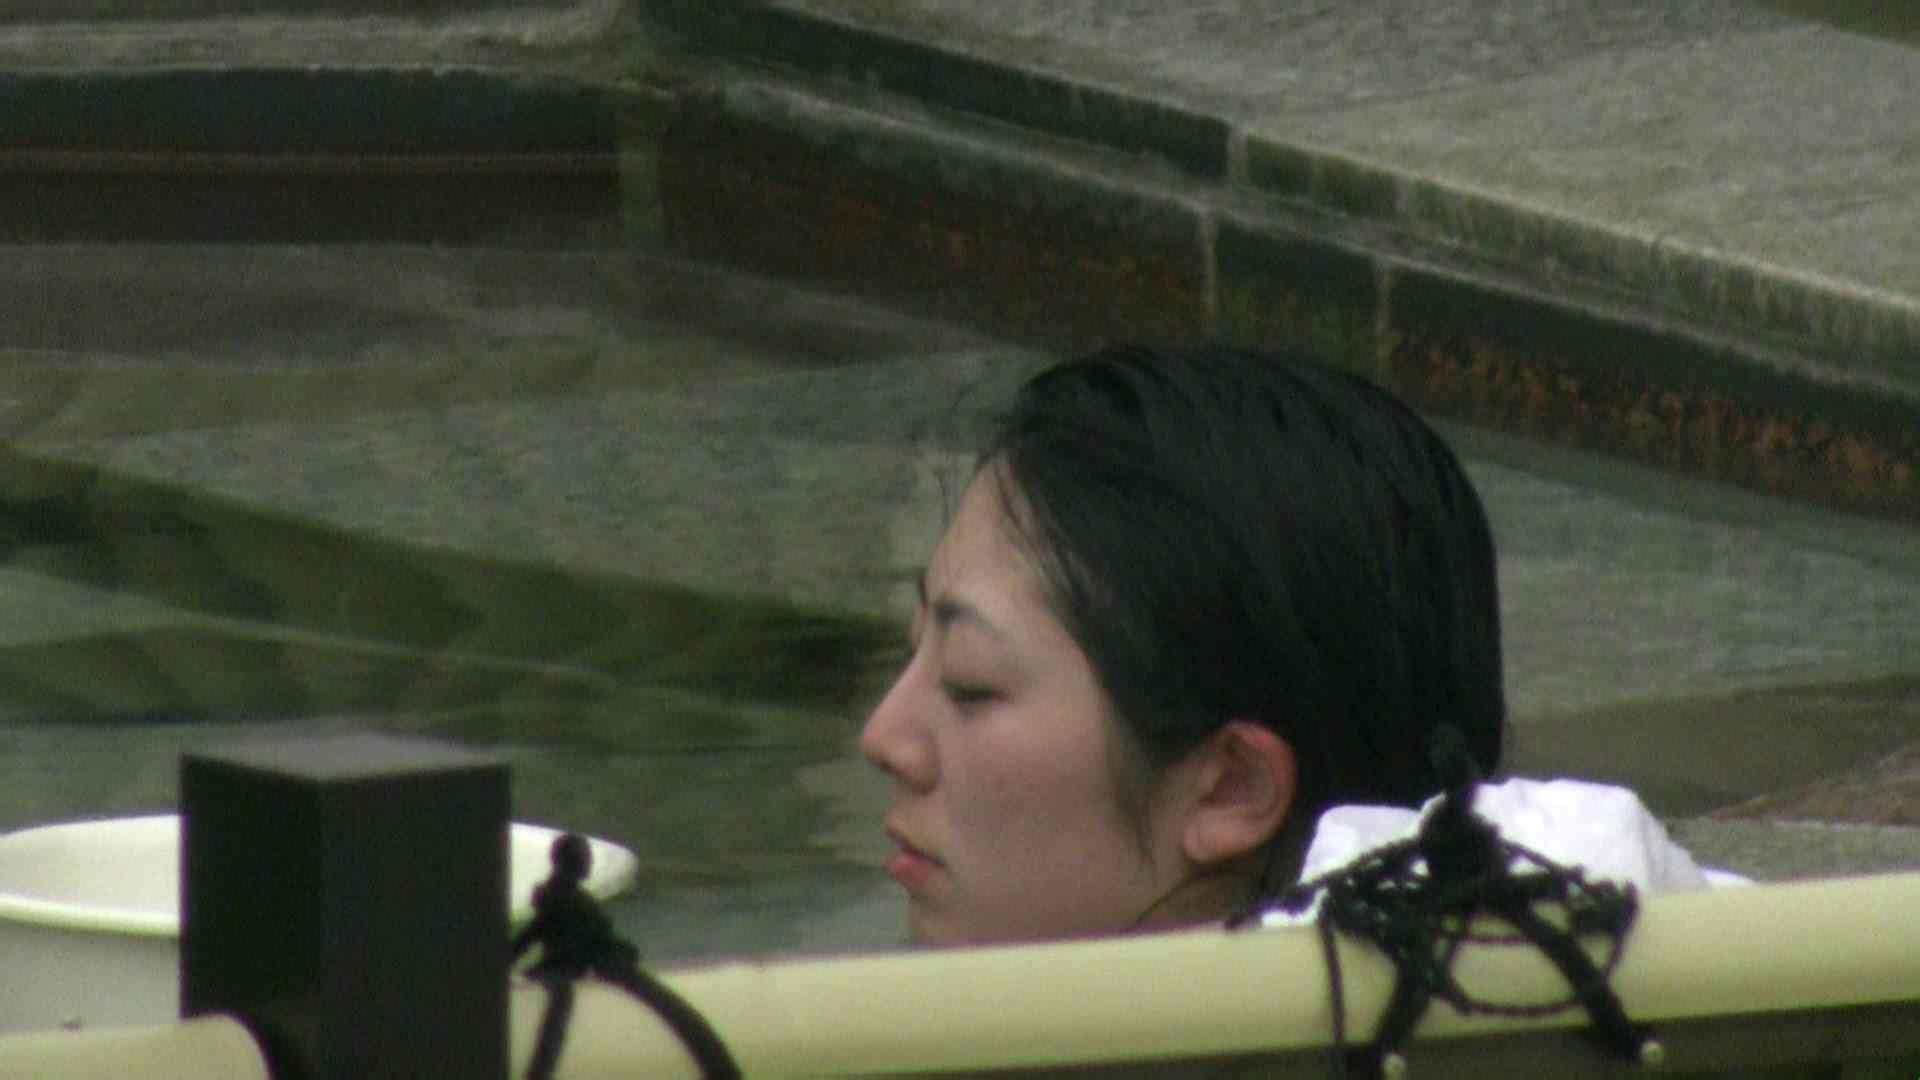 Aquaな露天風呂Vol.04 露天風呂編  94PIX 16